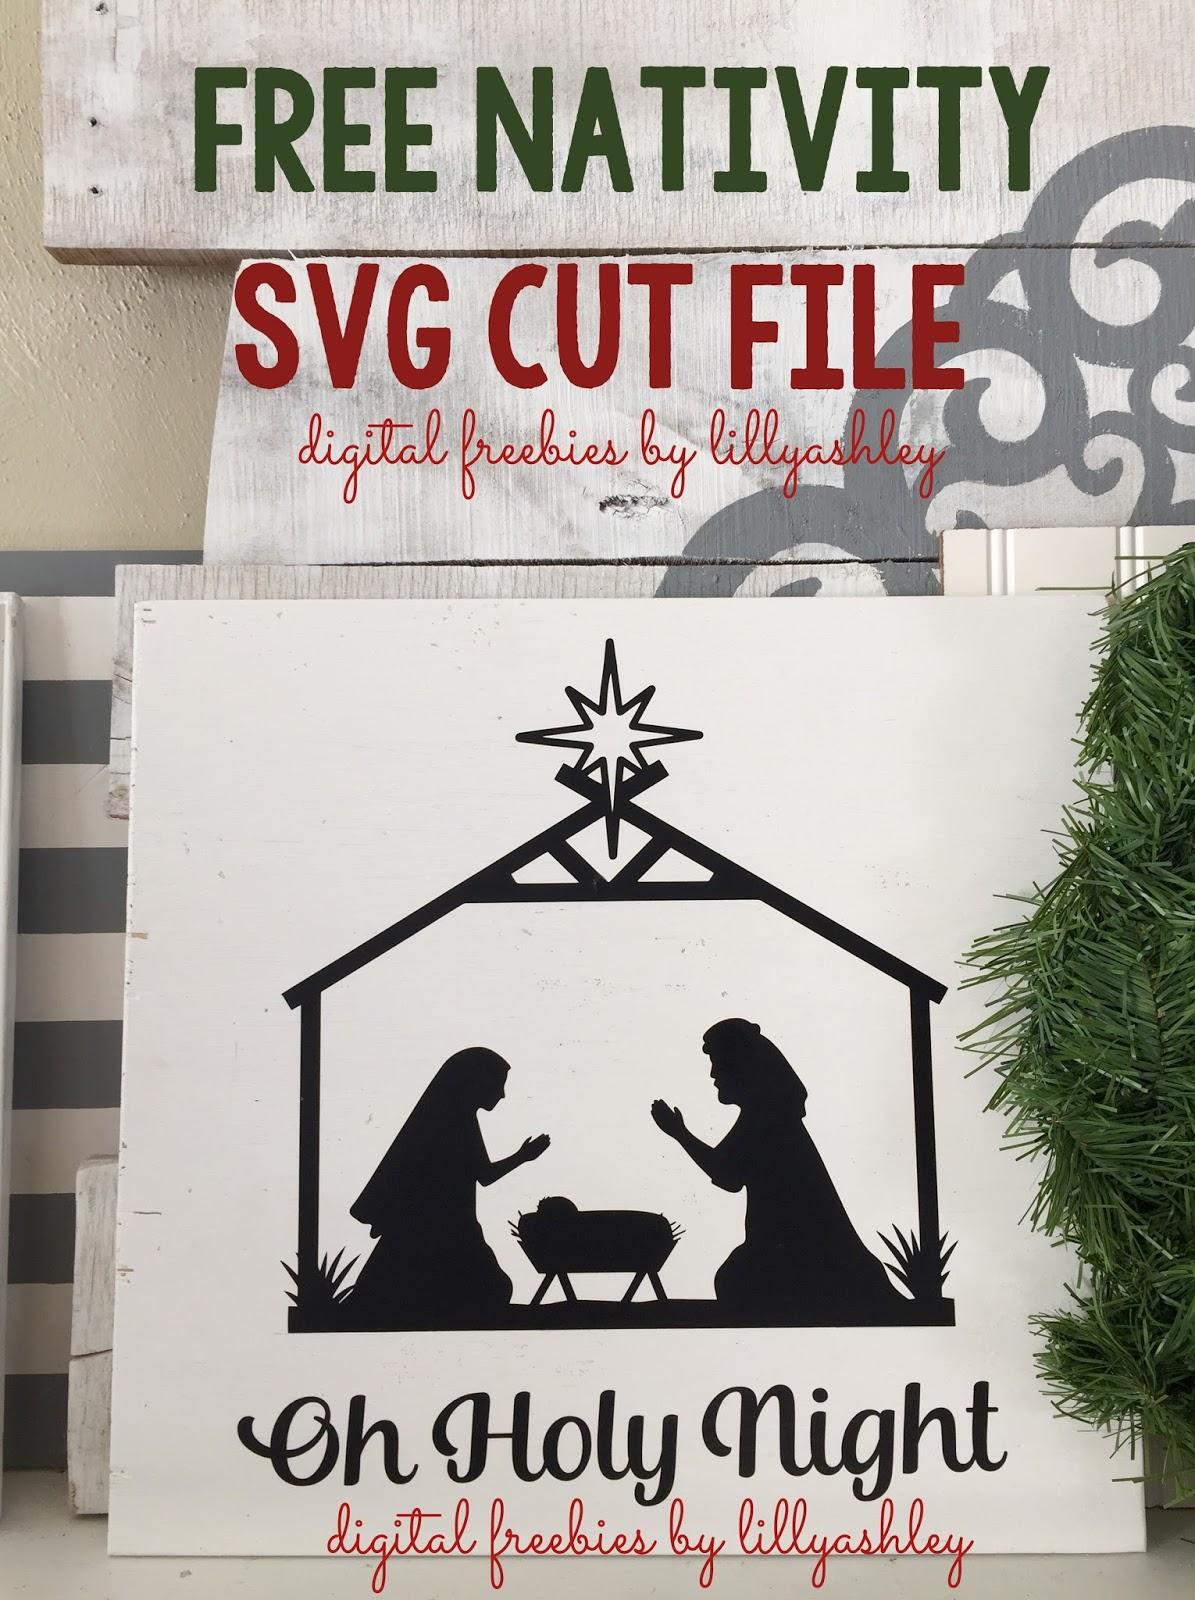 Manger Svg : manger, Create...Free, Files, Printables:, Nativity